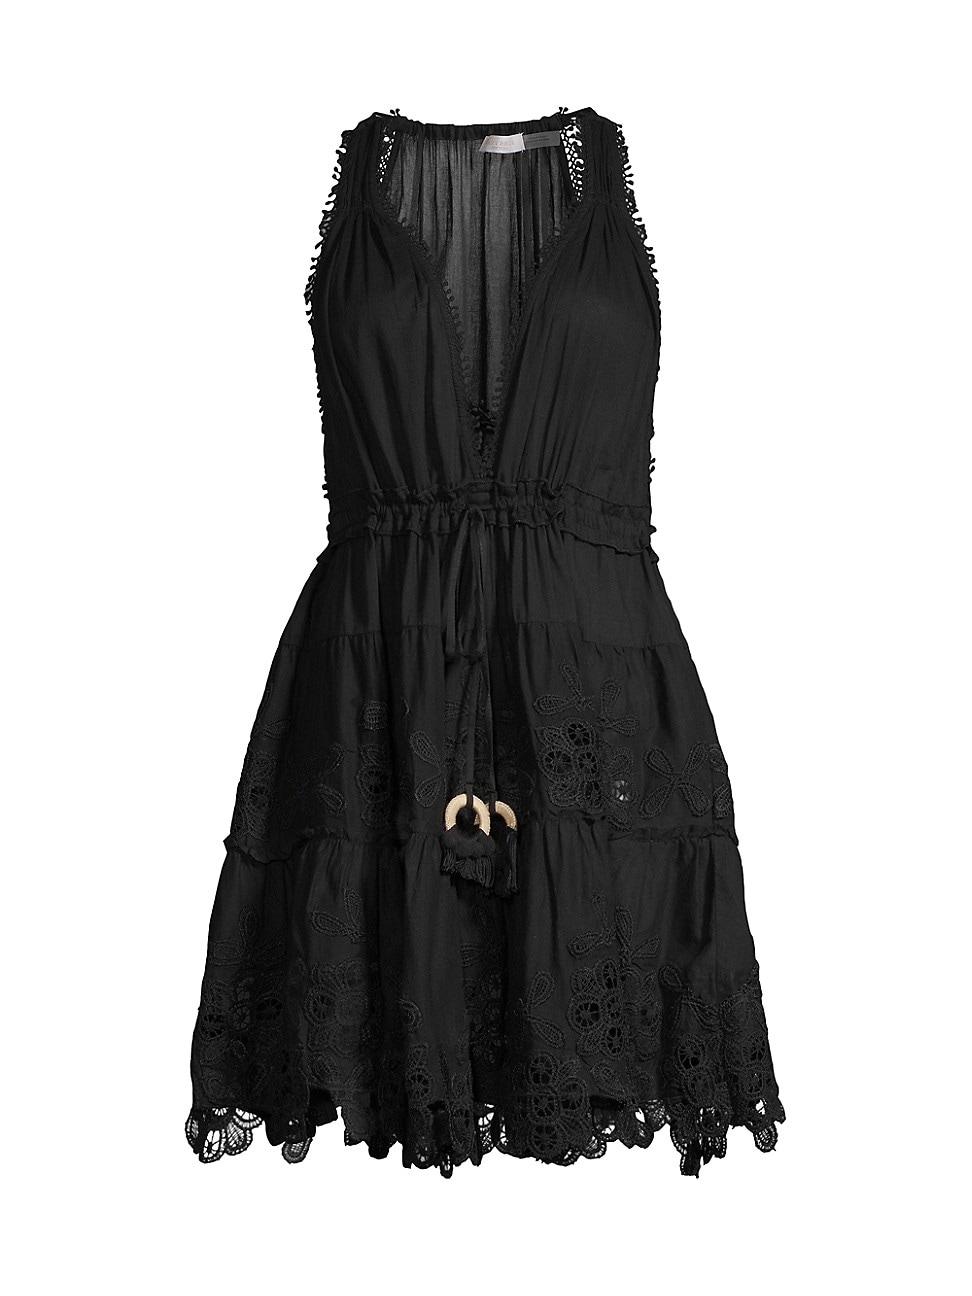 Ramy Brook WOMEN'S VILMA LACE EYELET A-LINE DRESS